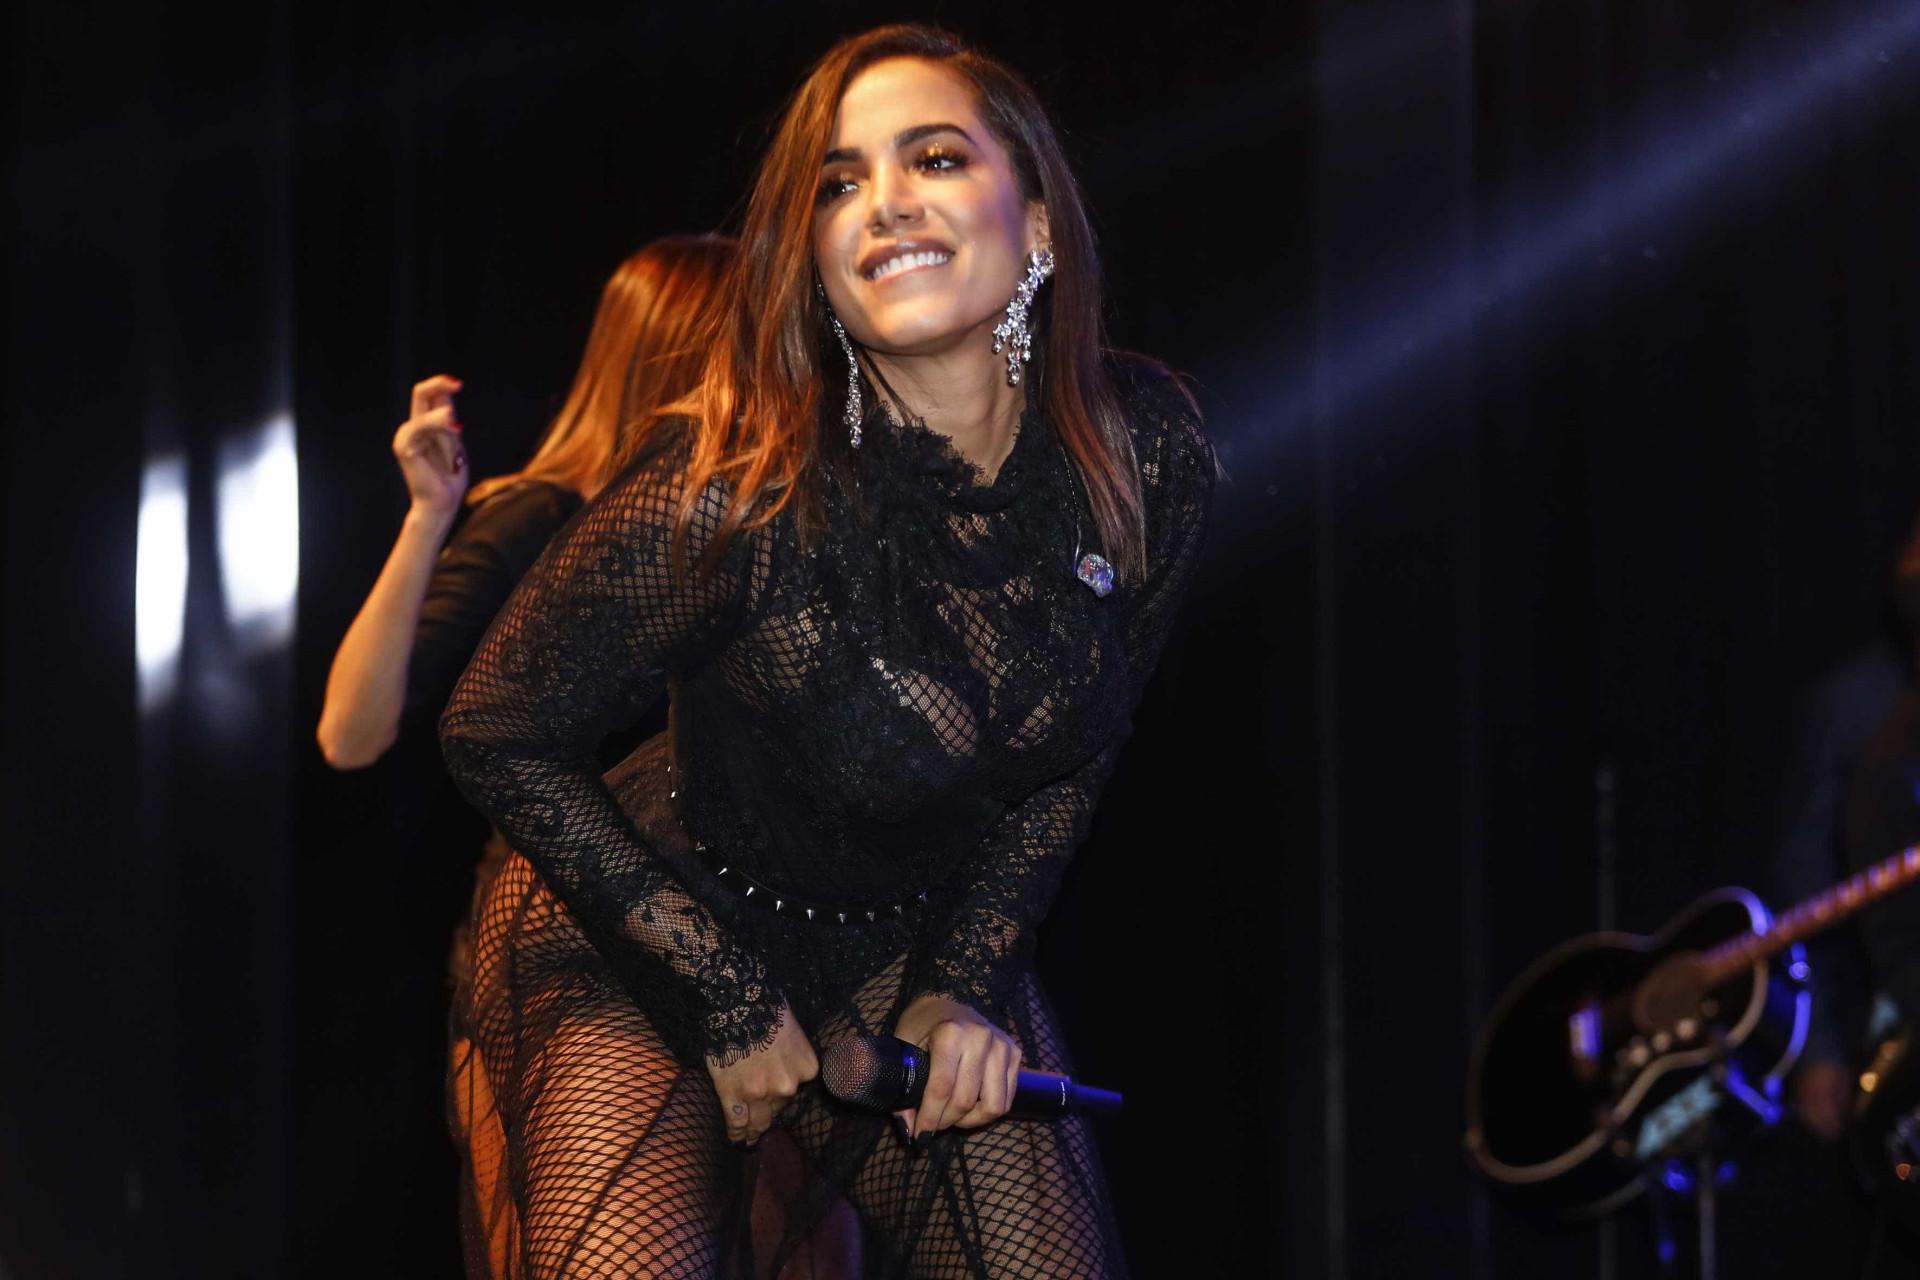 Vídeo: 'Vítima' da coreografia, Anitta cai durante concerto